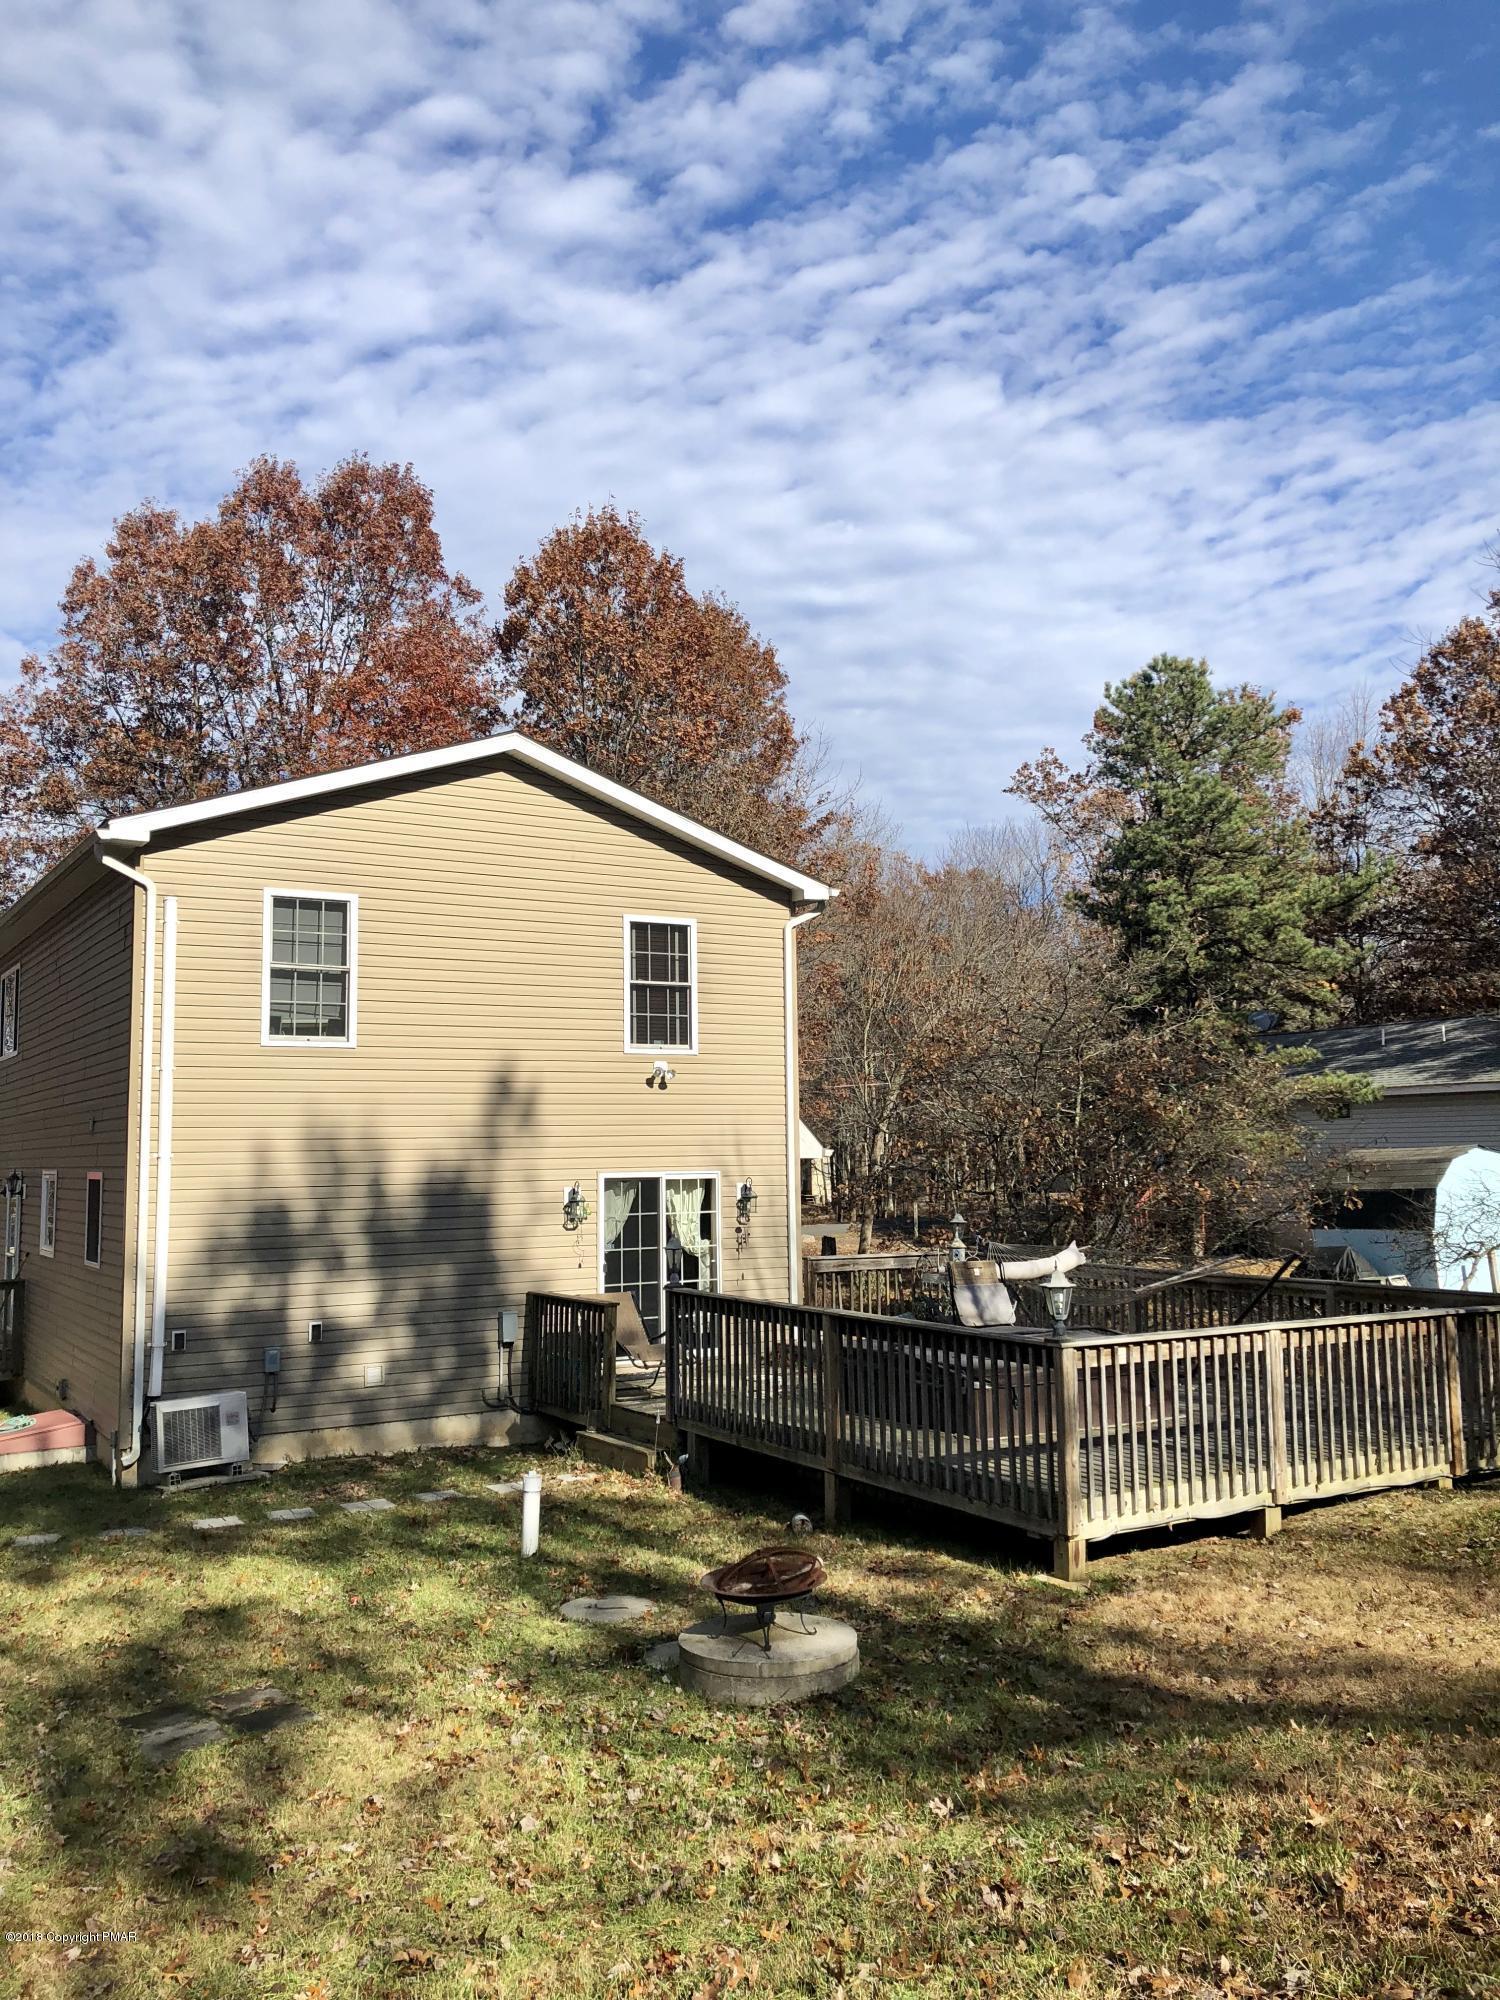 44 Stephen Way, Albrightsville, PA 18210